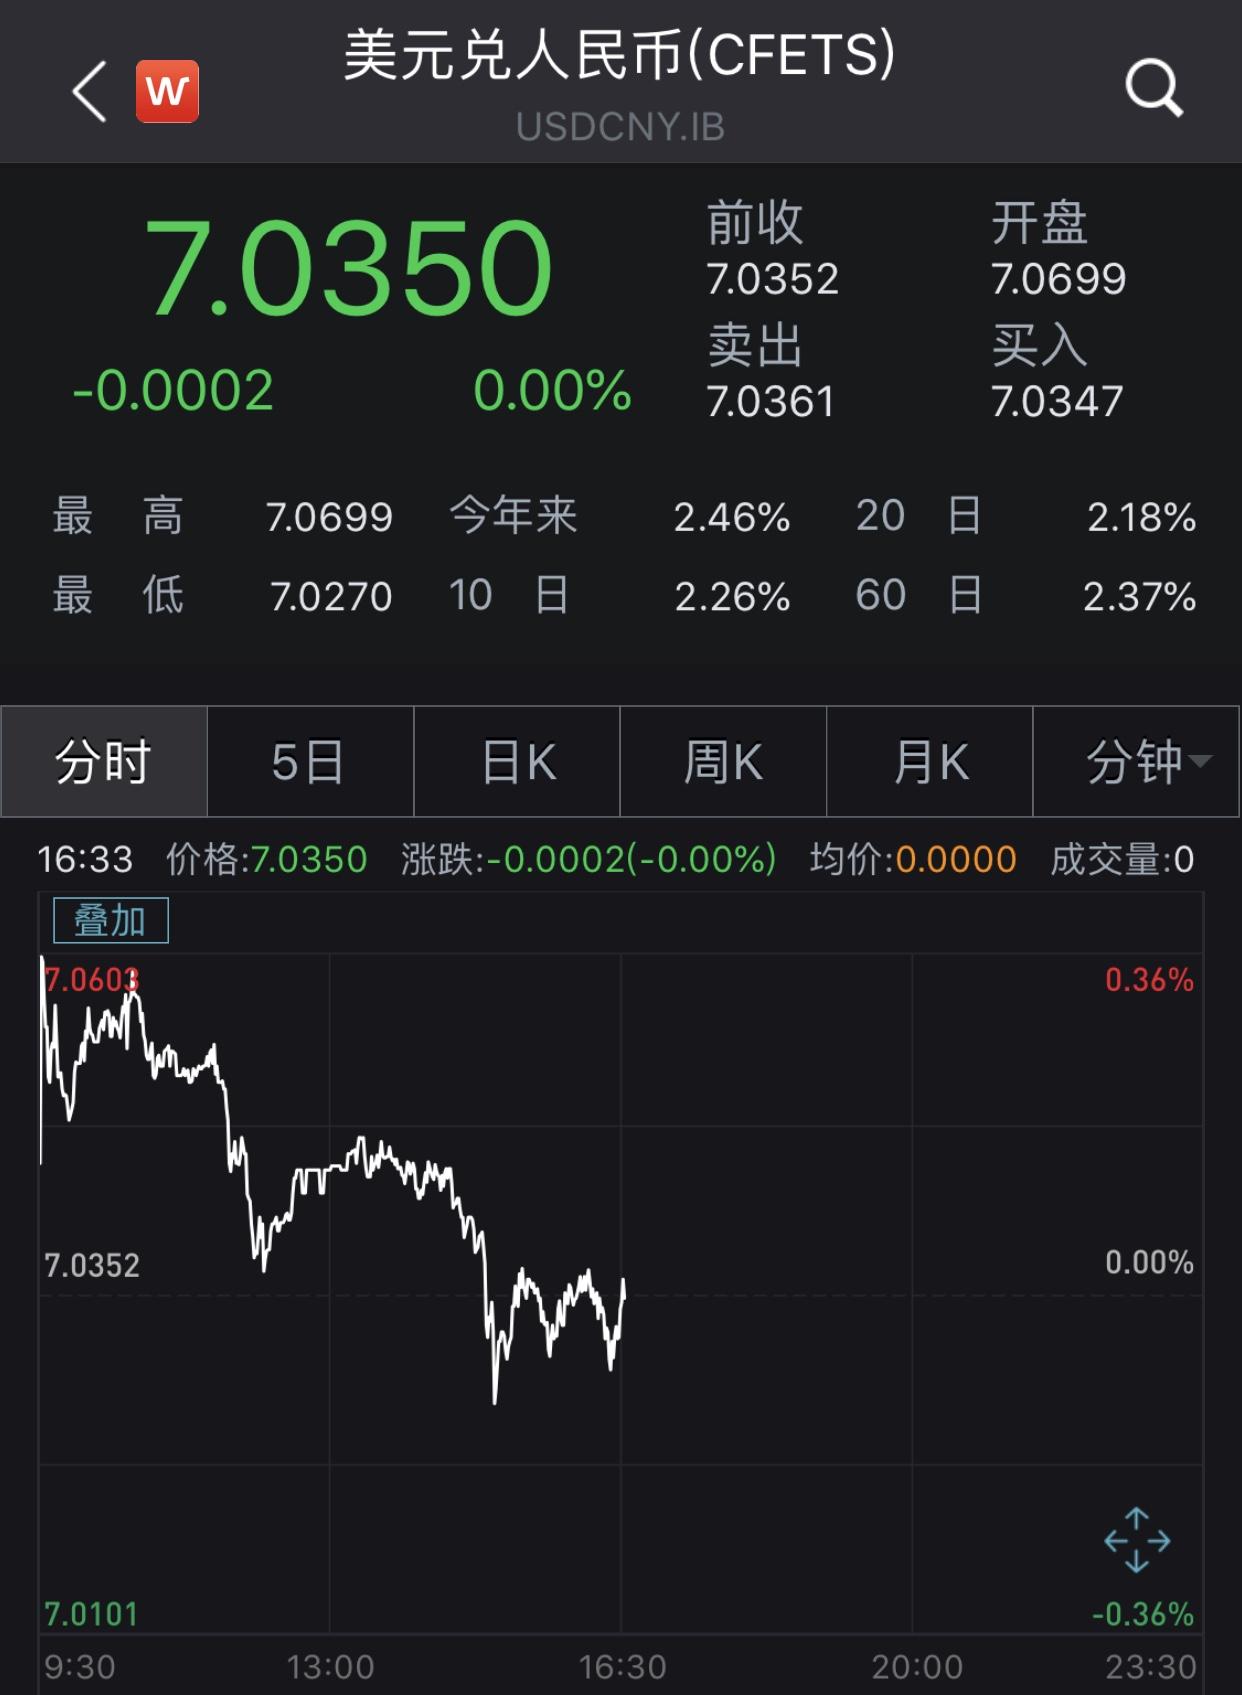 http://www.jywjkt.com/caijingguanzhu/185982.html